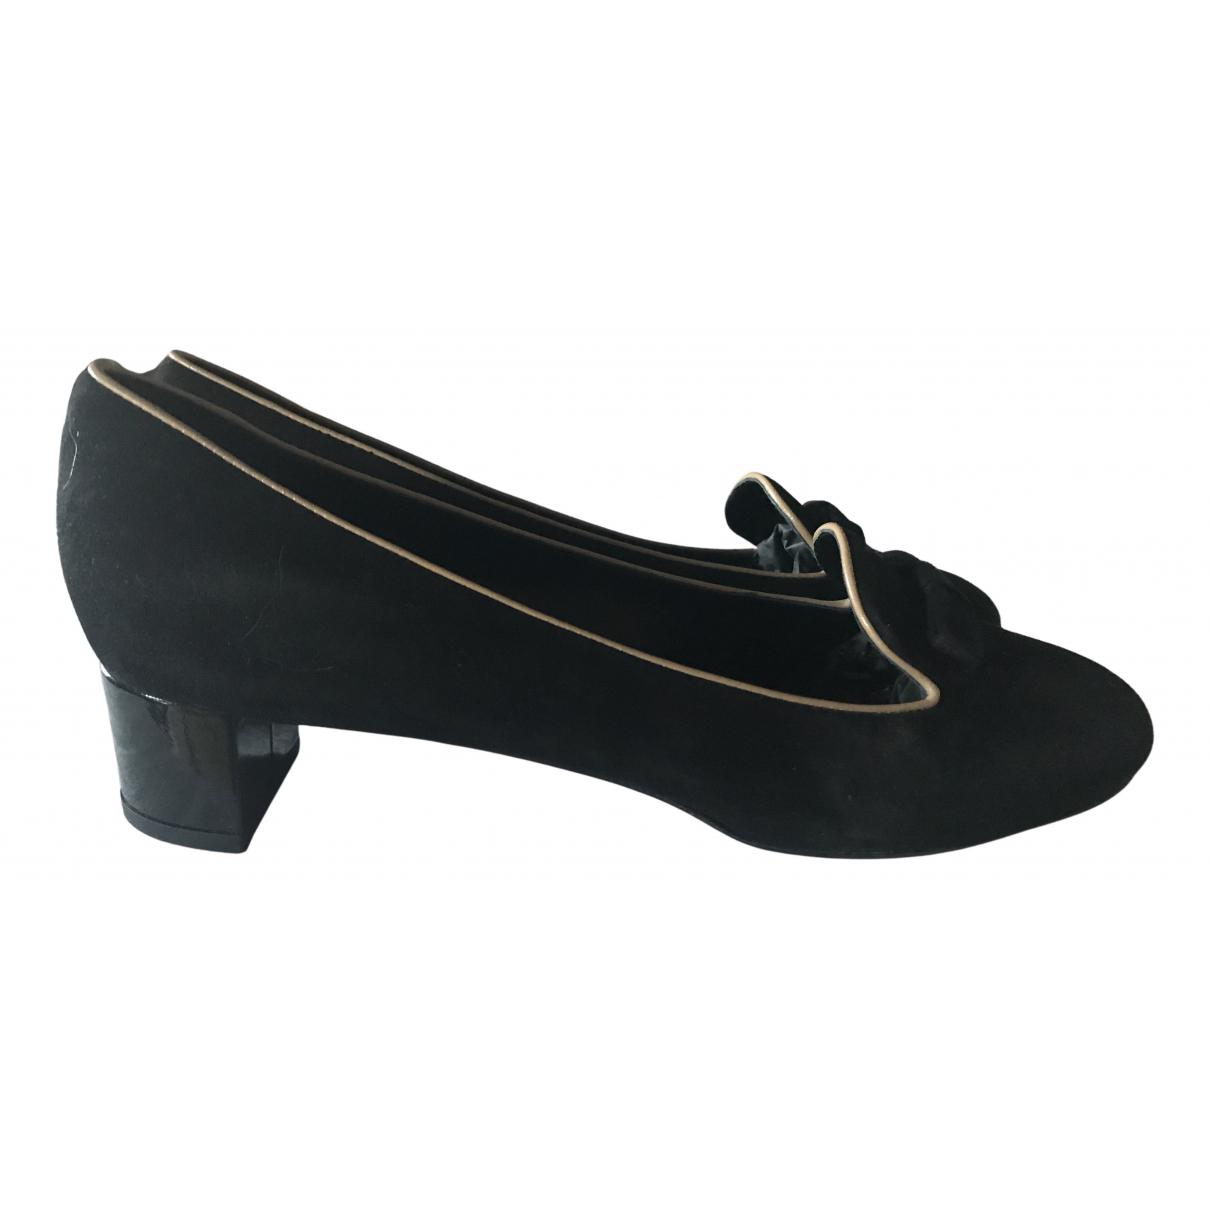 Louis Vuitton N Black Suede Heels for Women 38.5 IT